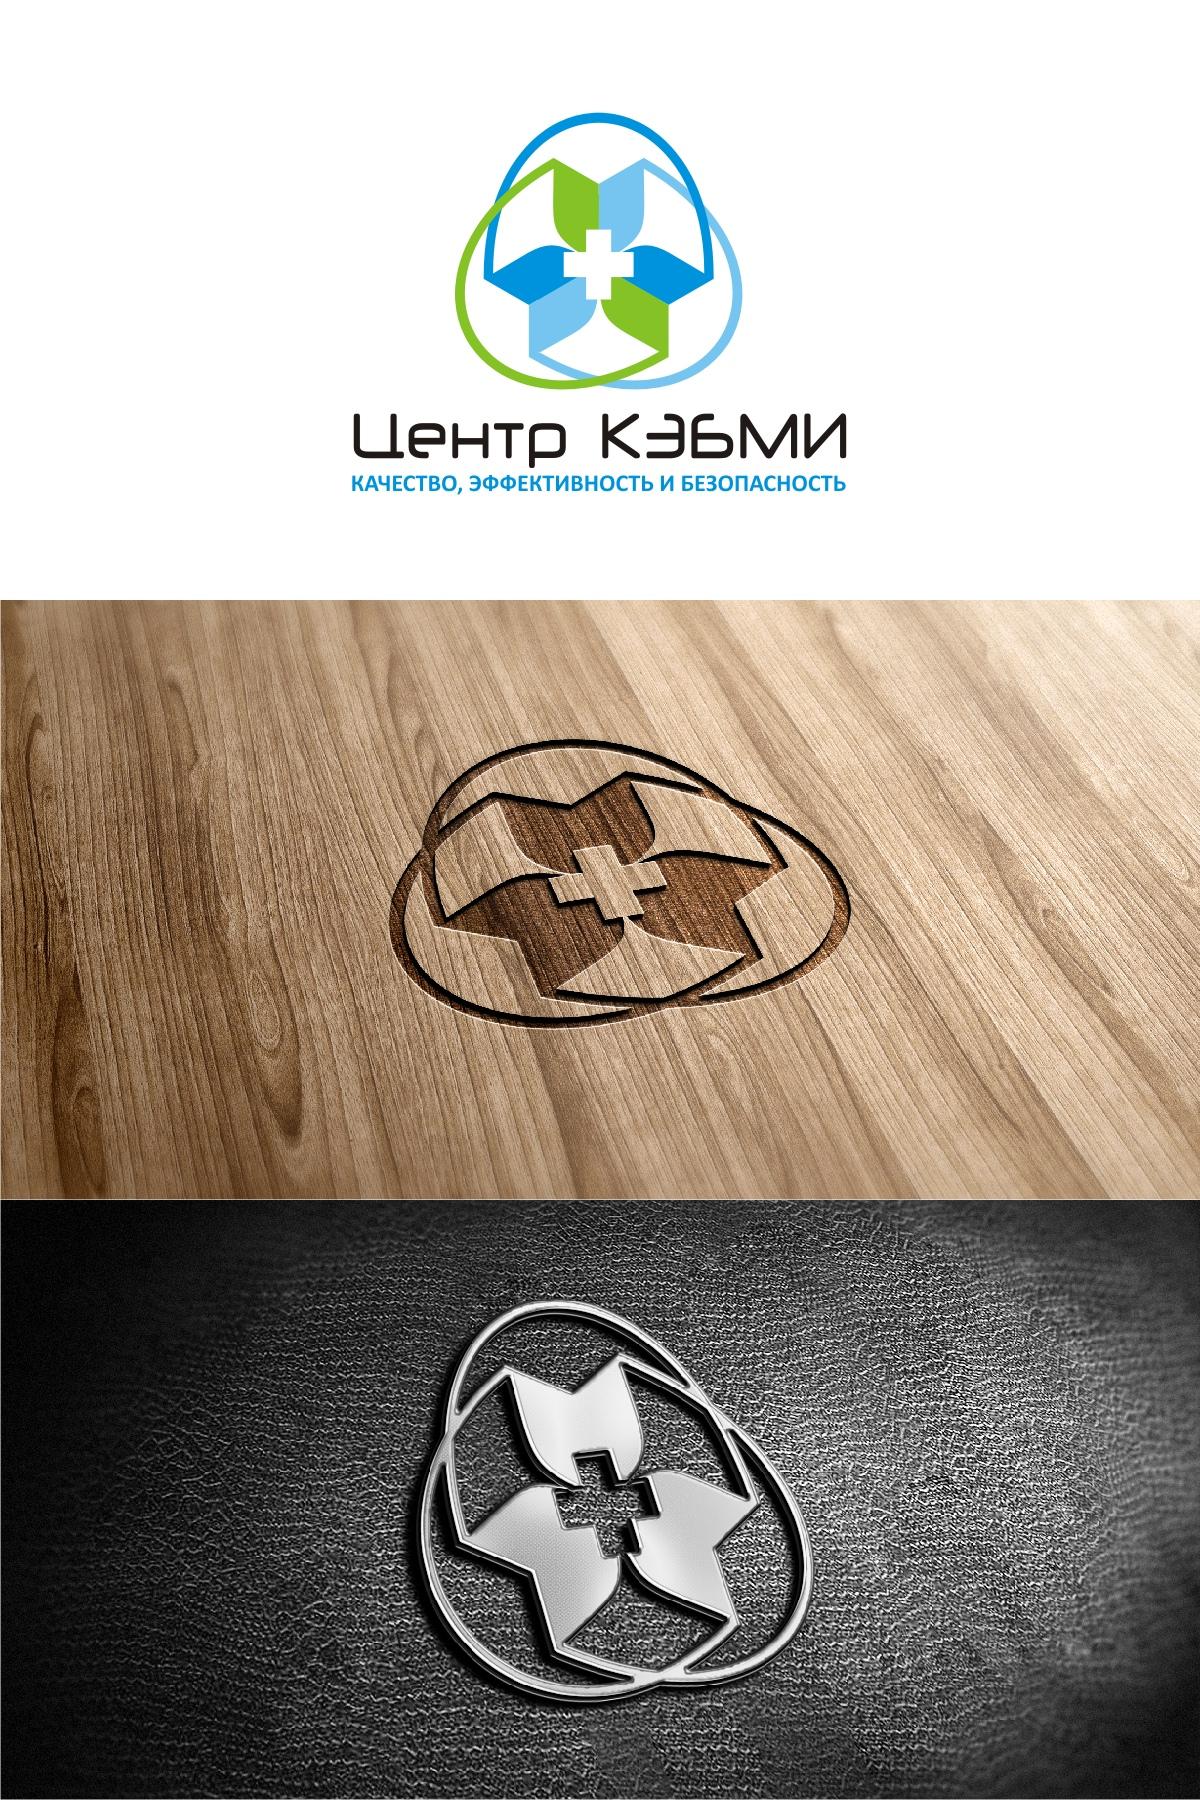 Редизайн логотипа АНО Центр КЭБМИ - BREVIS фото f_3005b26a0735d1bb.jpg